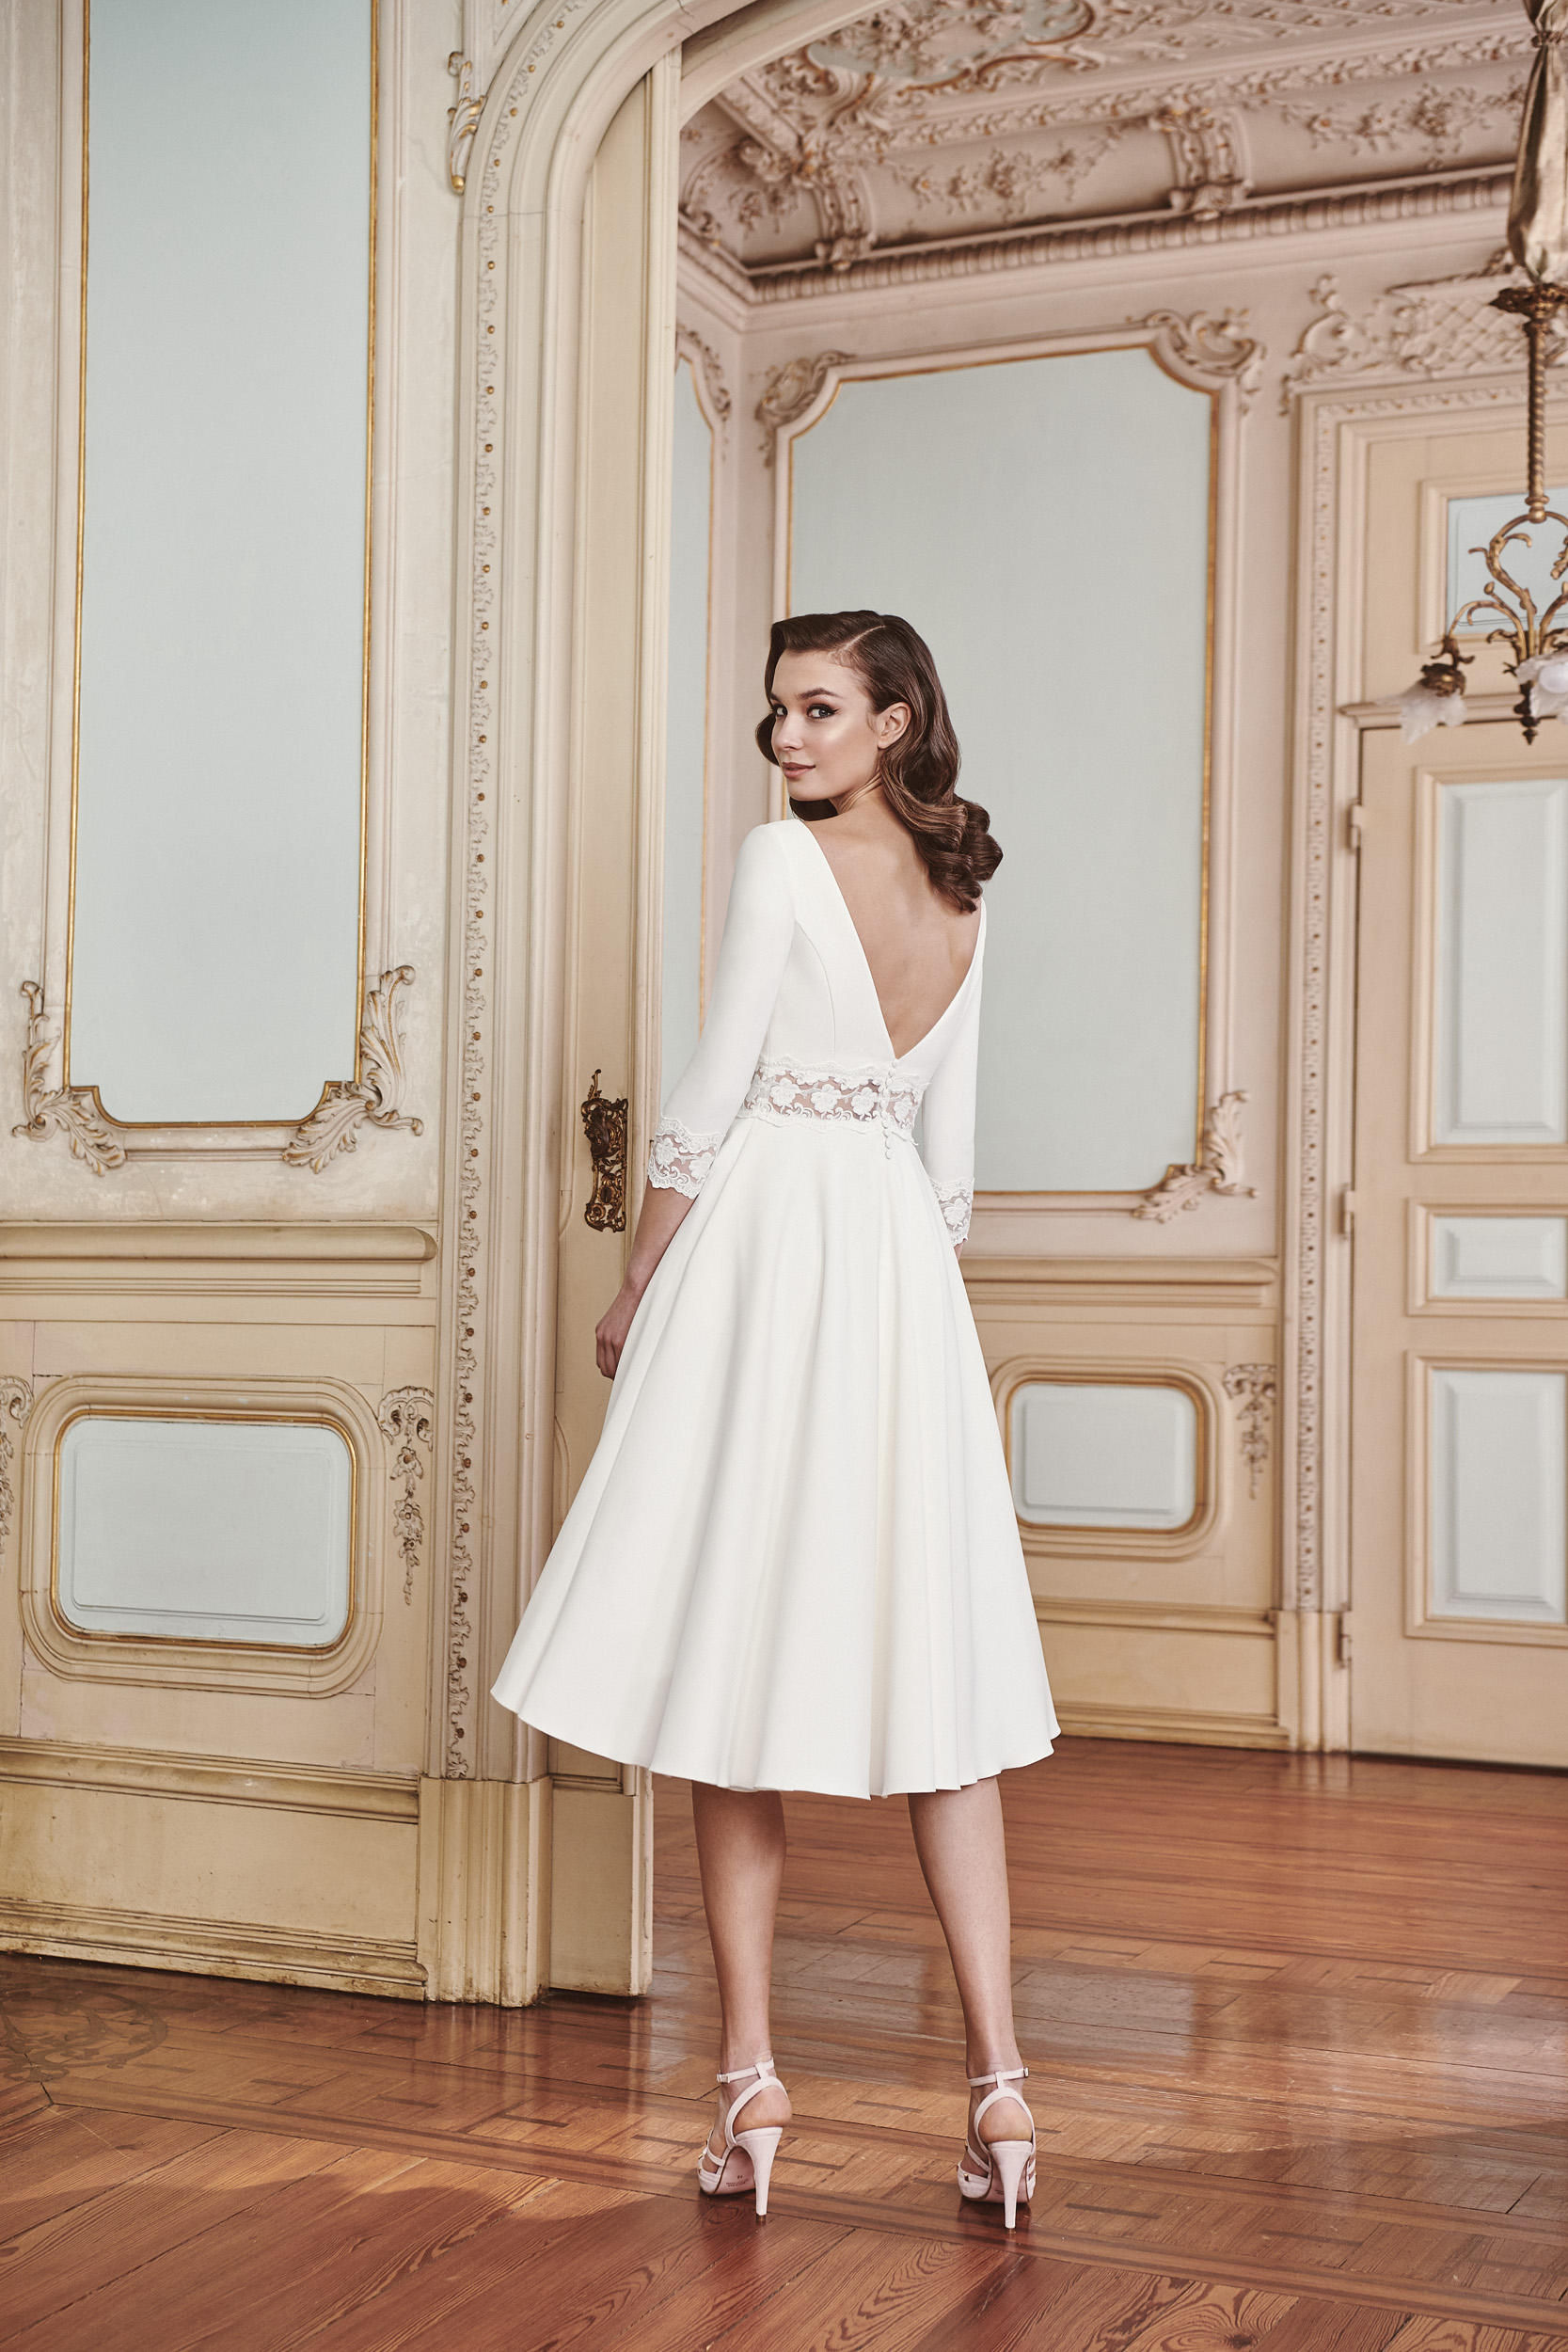 Vestido de novia 2021 - Lorena - detras